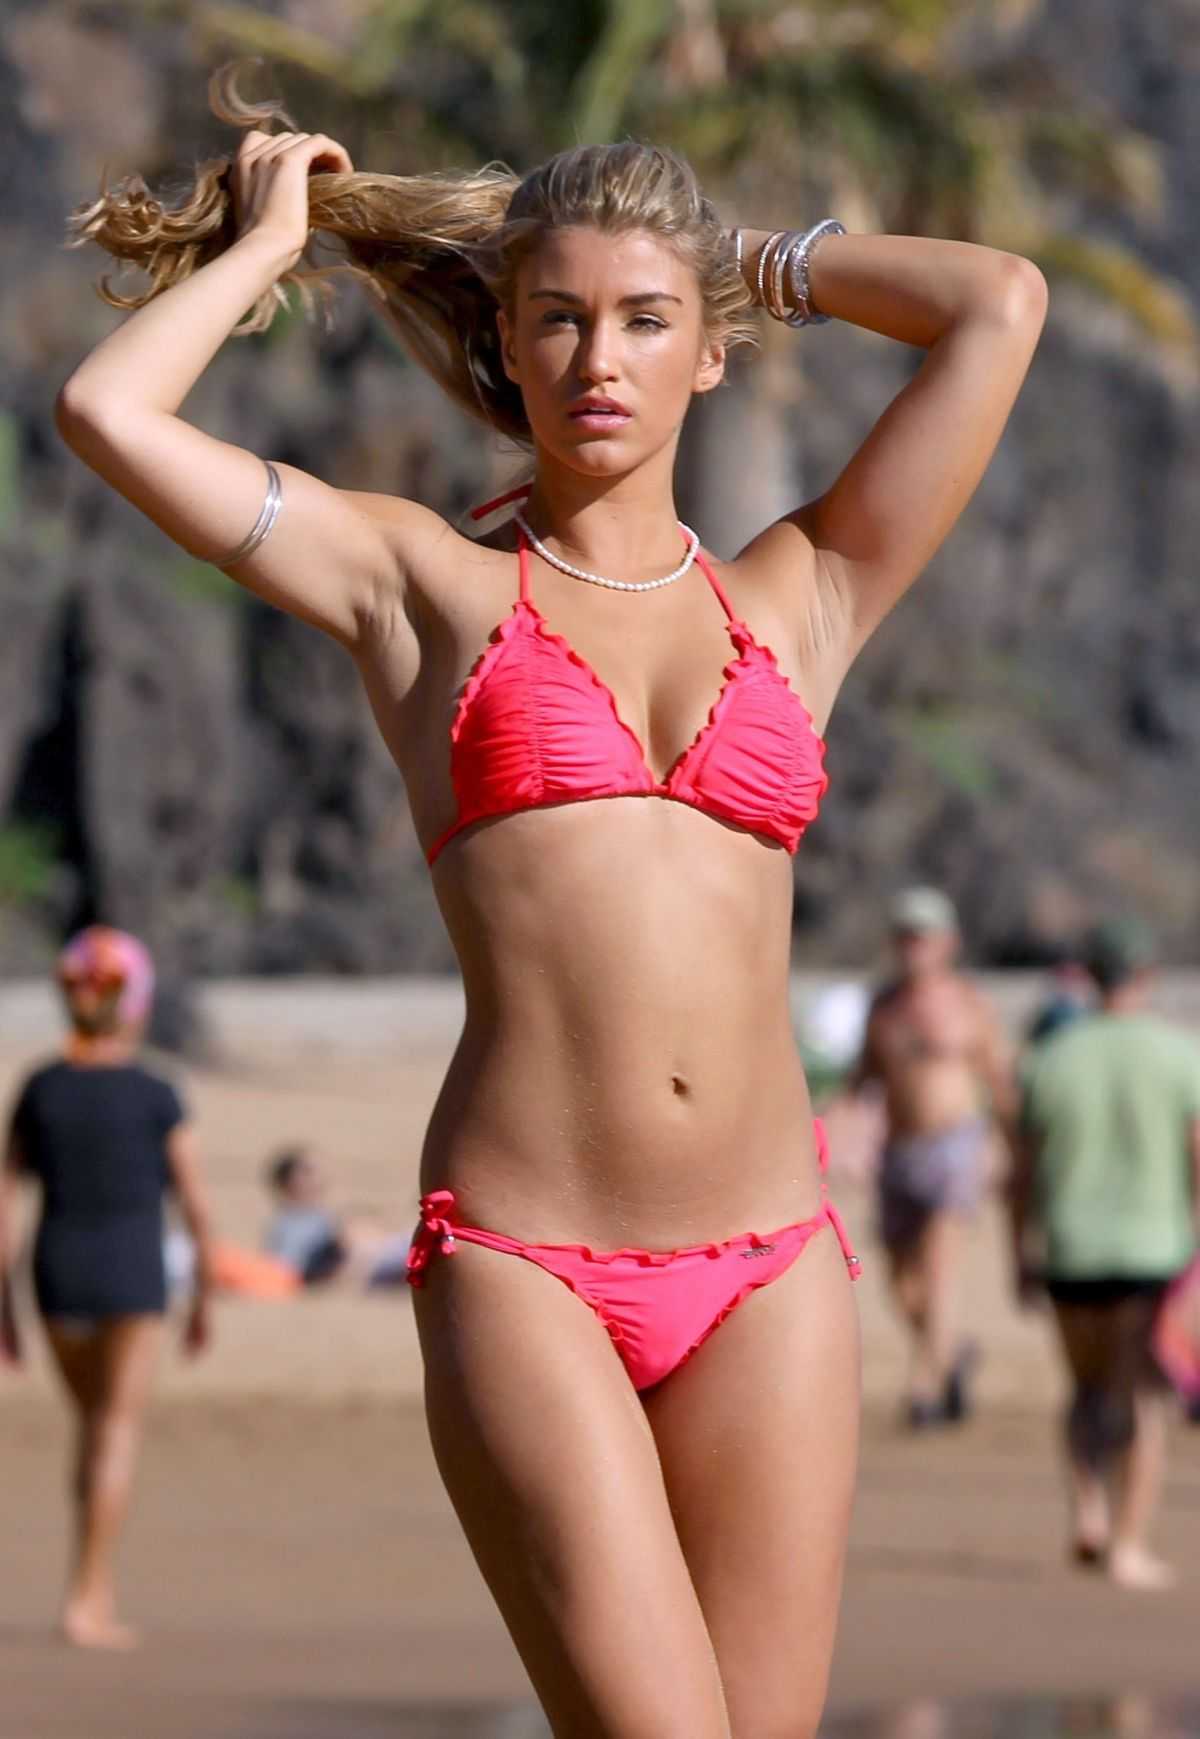 Candid bikini beach pics